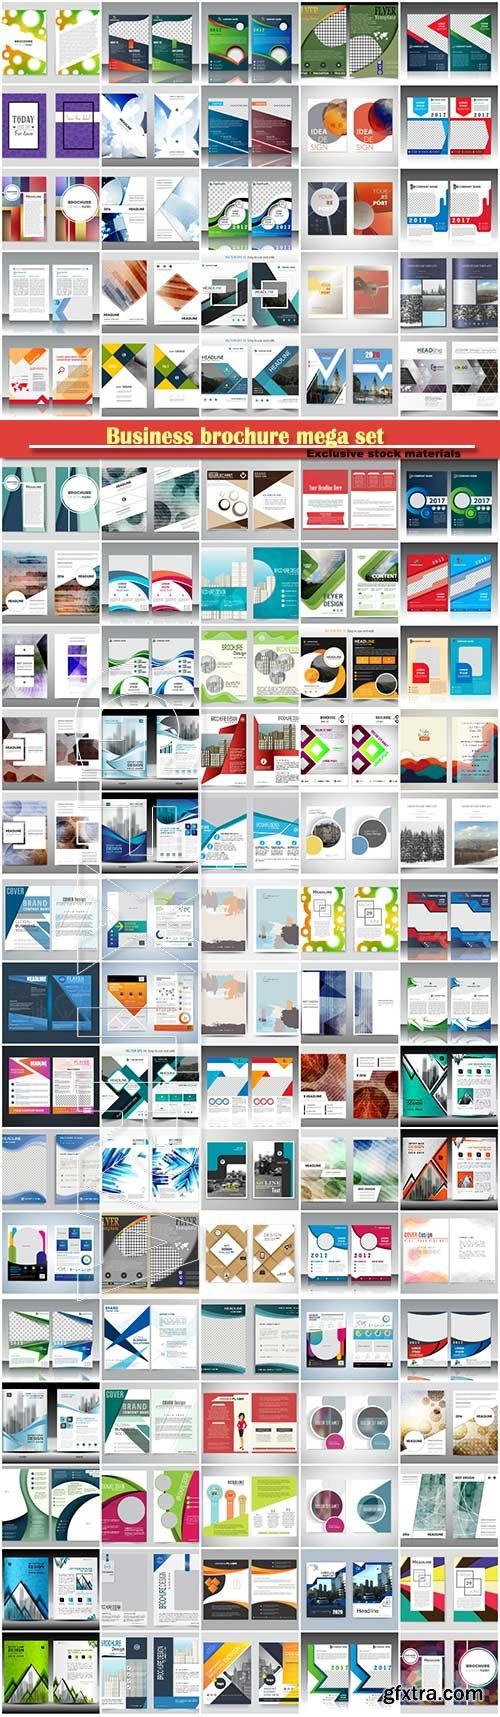 Business brochure mega set, vector flyers template